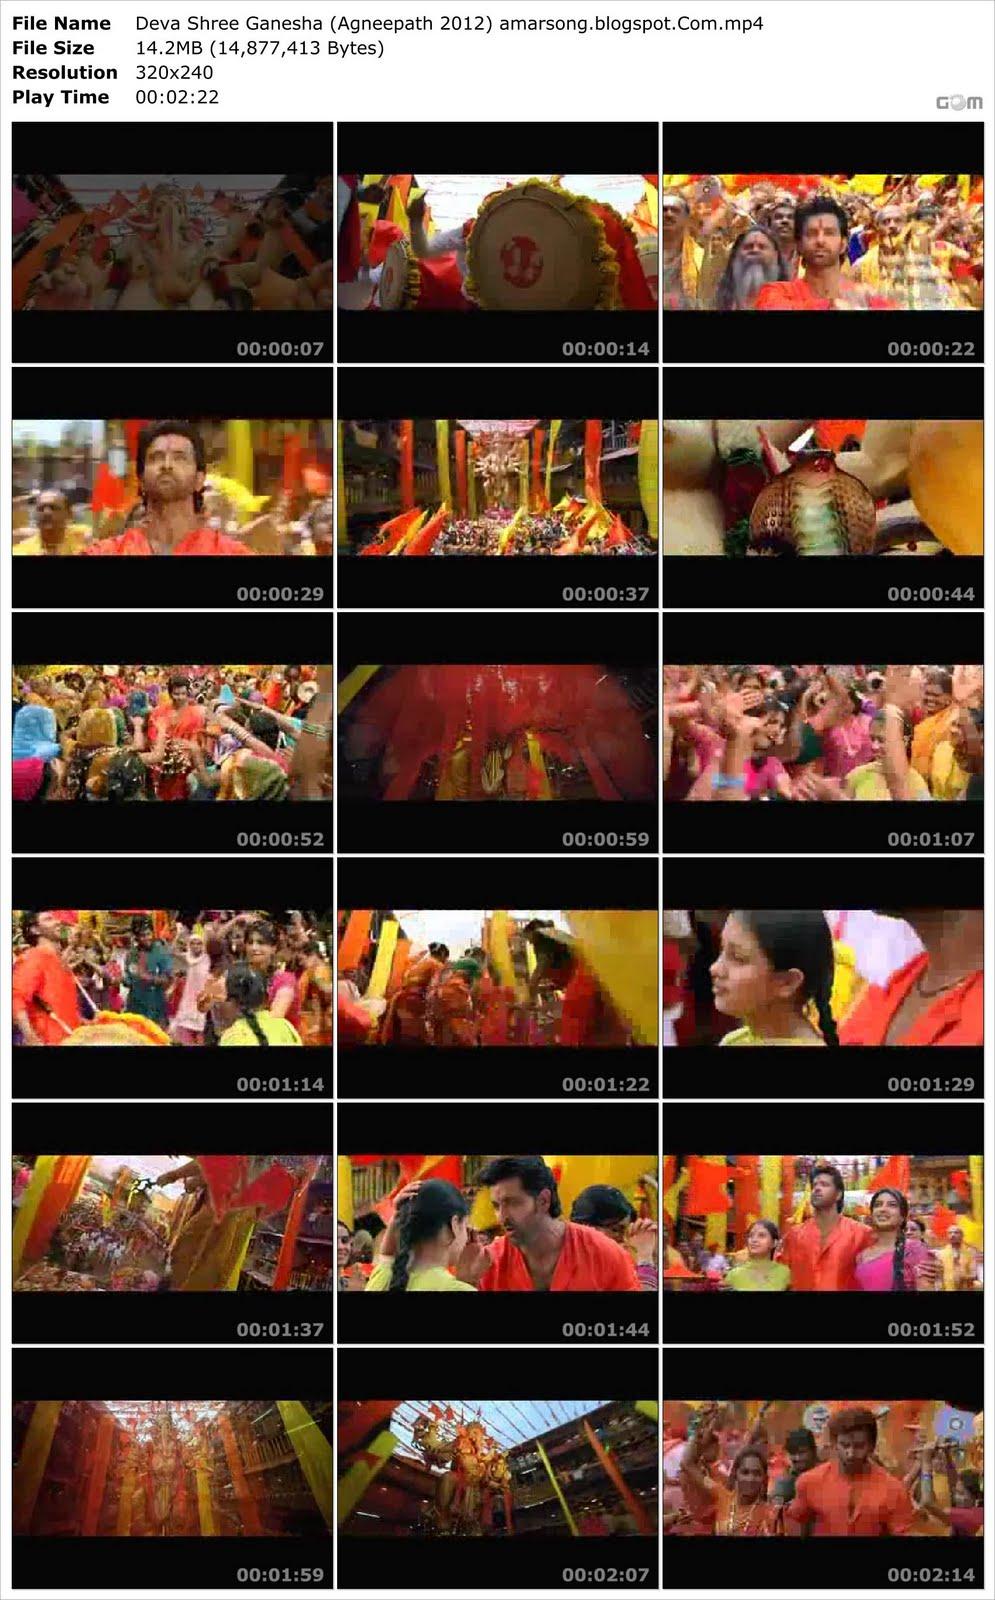 Deva Shree Ganesha - Agneepath (2012) Video Download MP4 Format